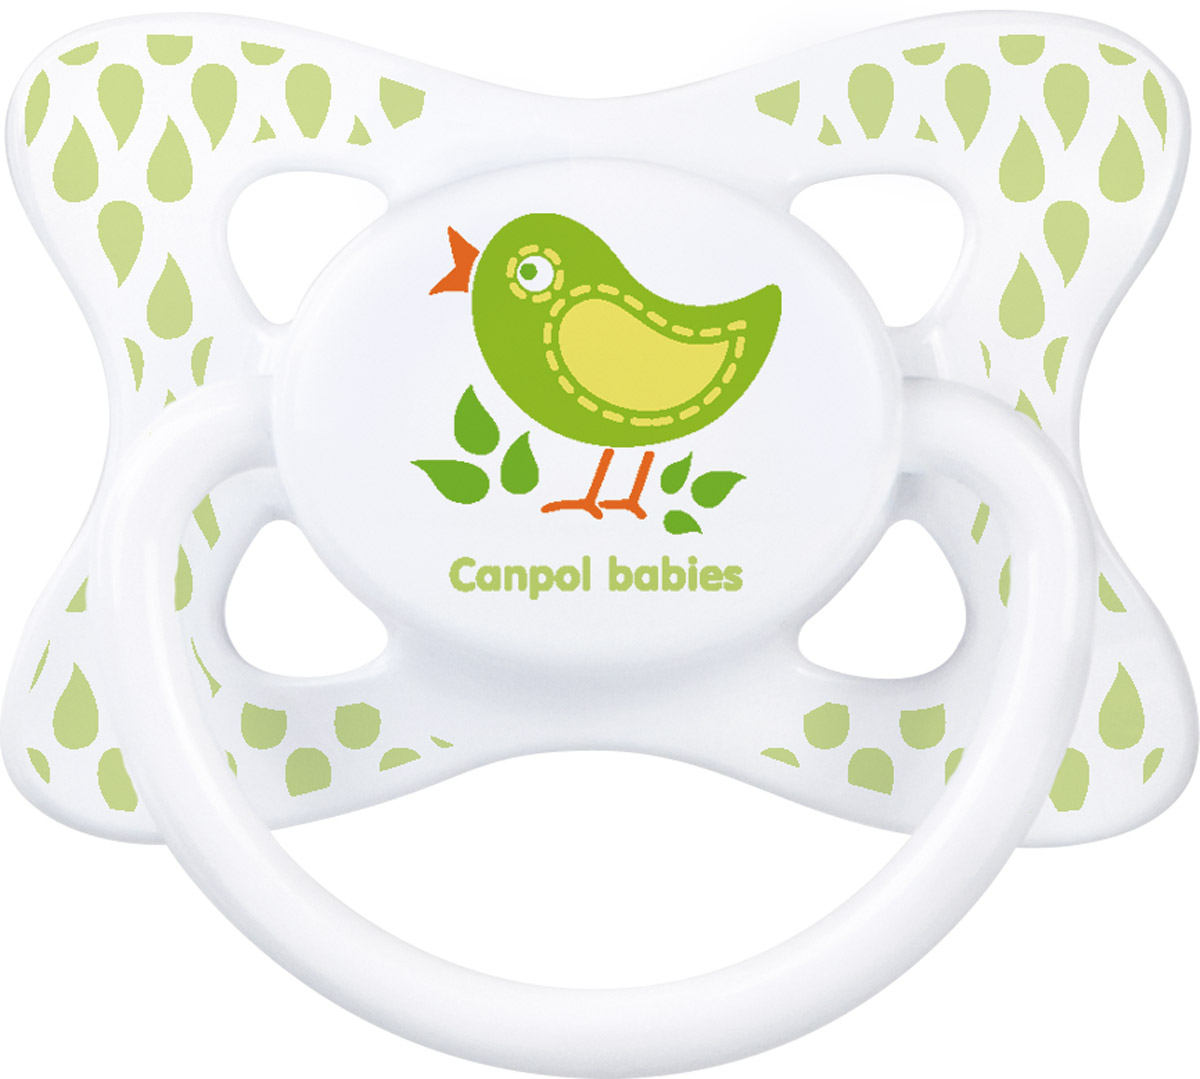 Canpol Babies Пустышка латексная Птичка от 6 до 18 месяцев пустышки canpol латексная волшебная сказка 0 6 мес 22 603